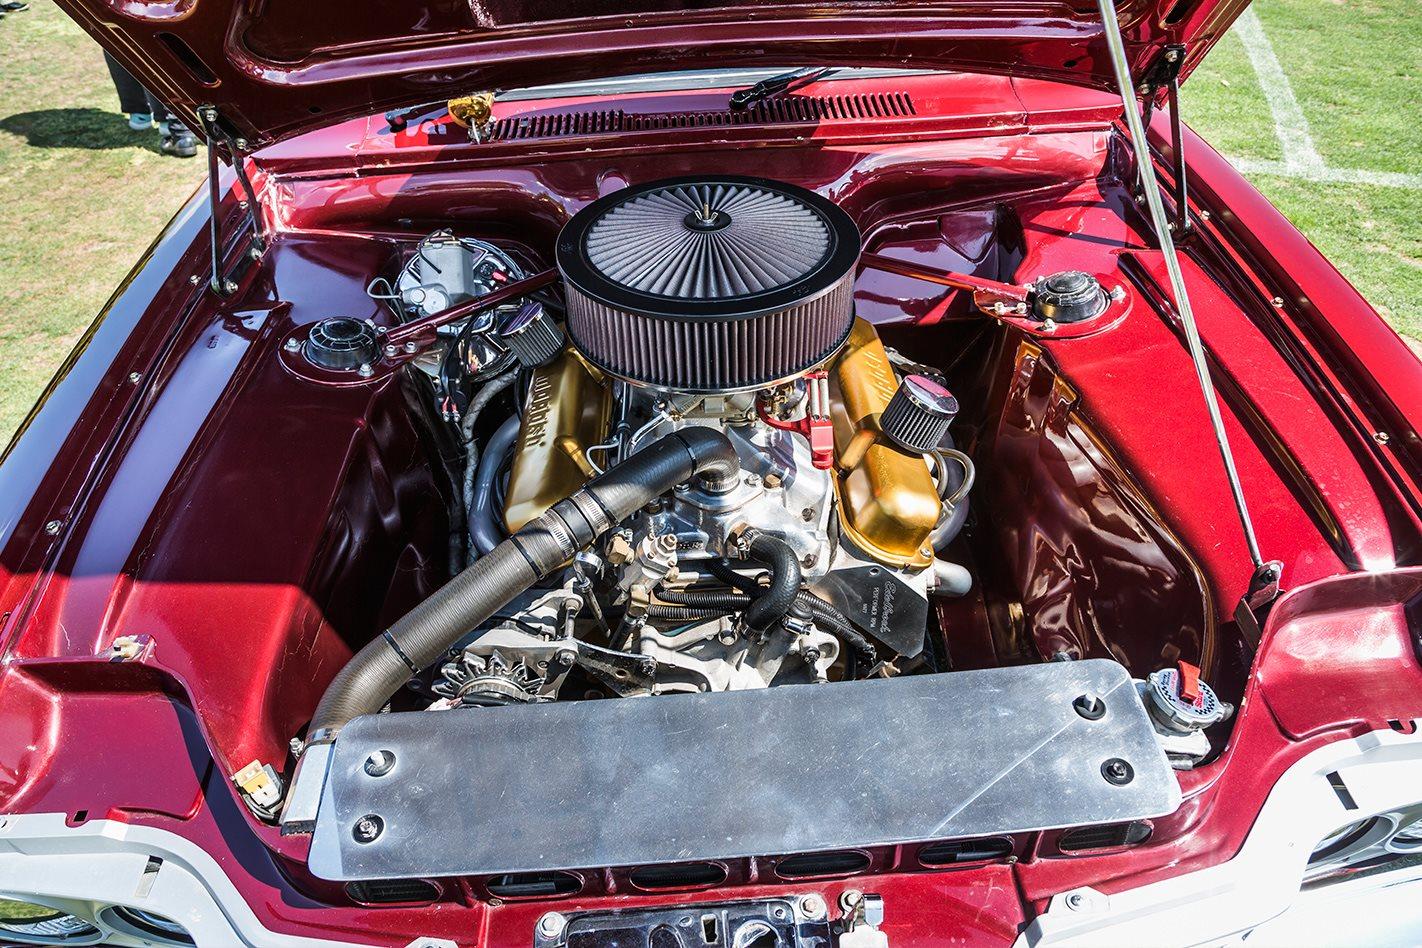 Chrysler engine bay